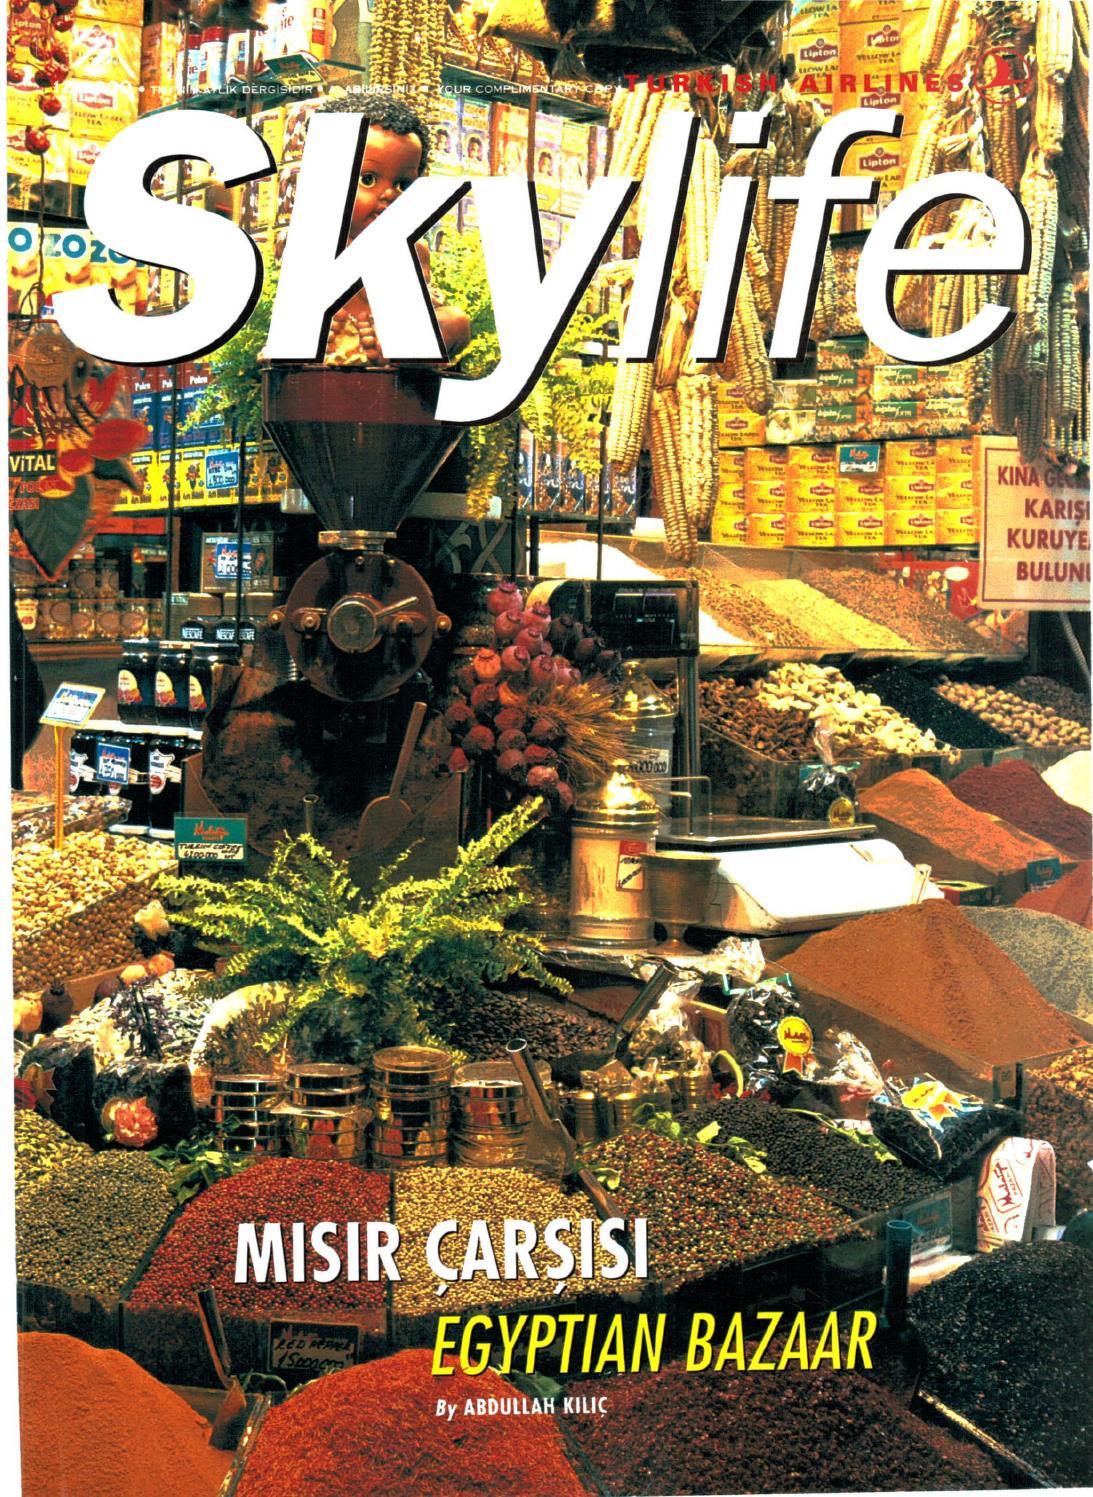 2000 12 By Skylife Magazine - Issuu dedans Super U Salon De Jardin